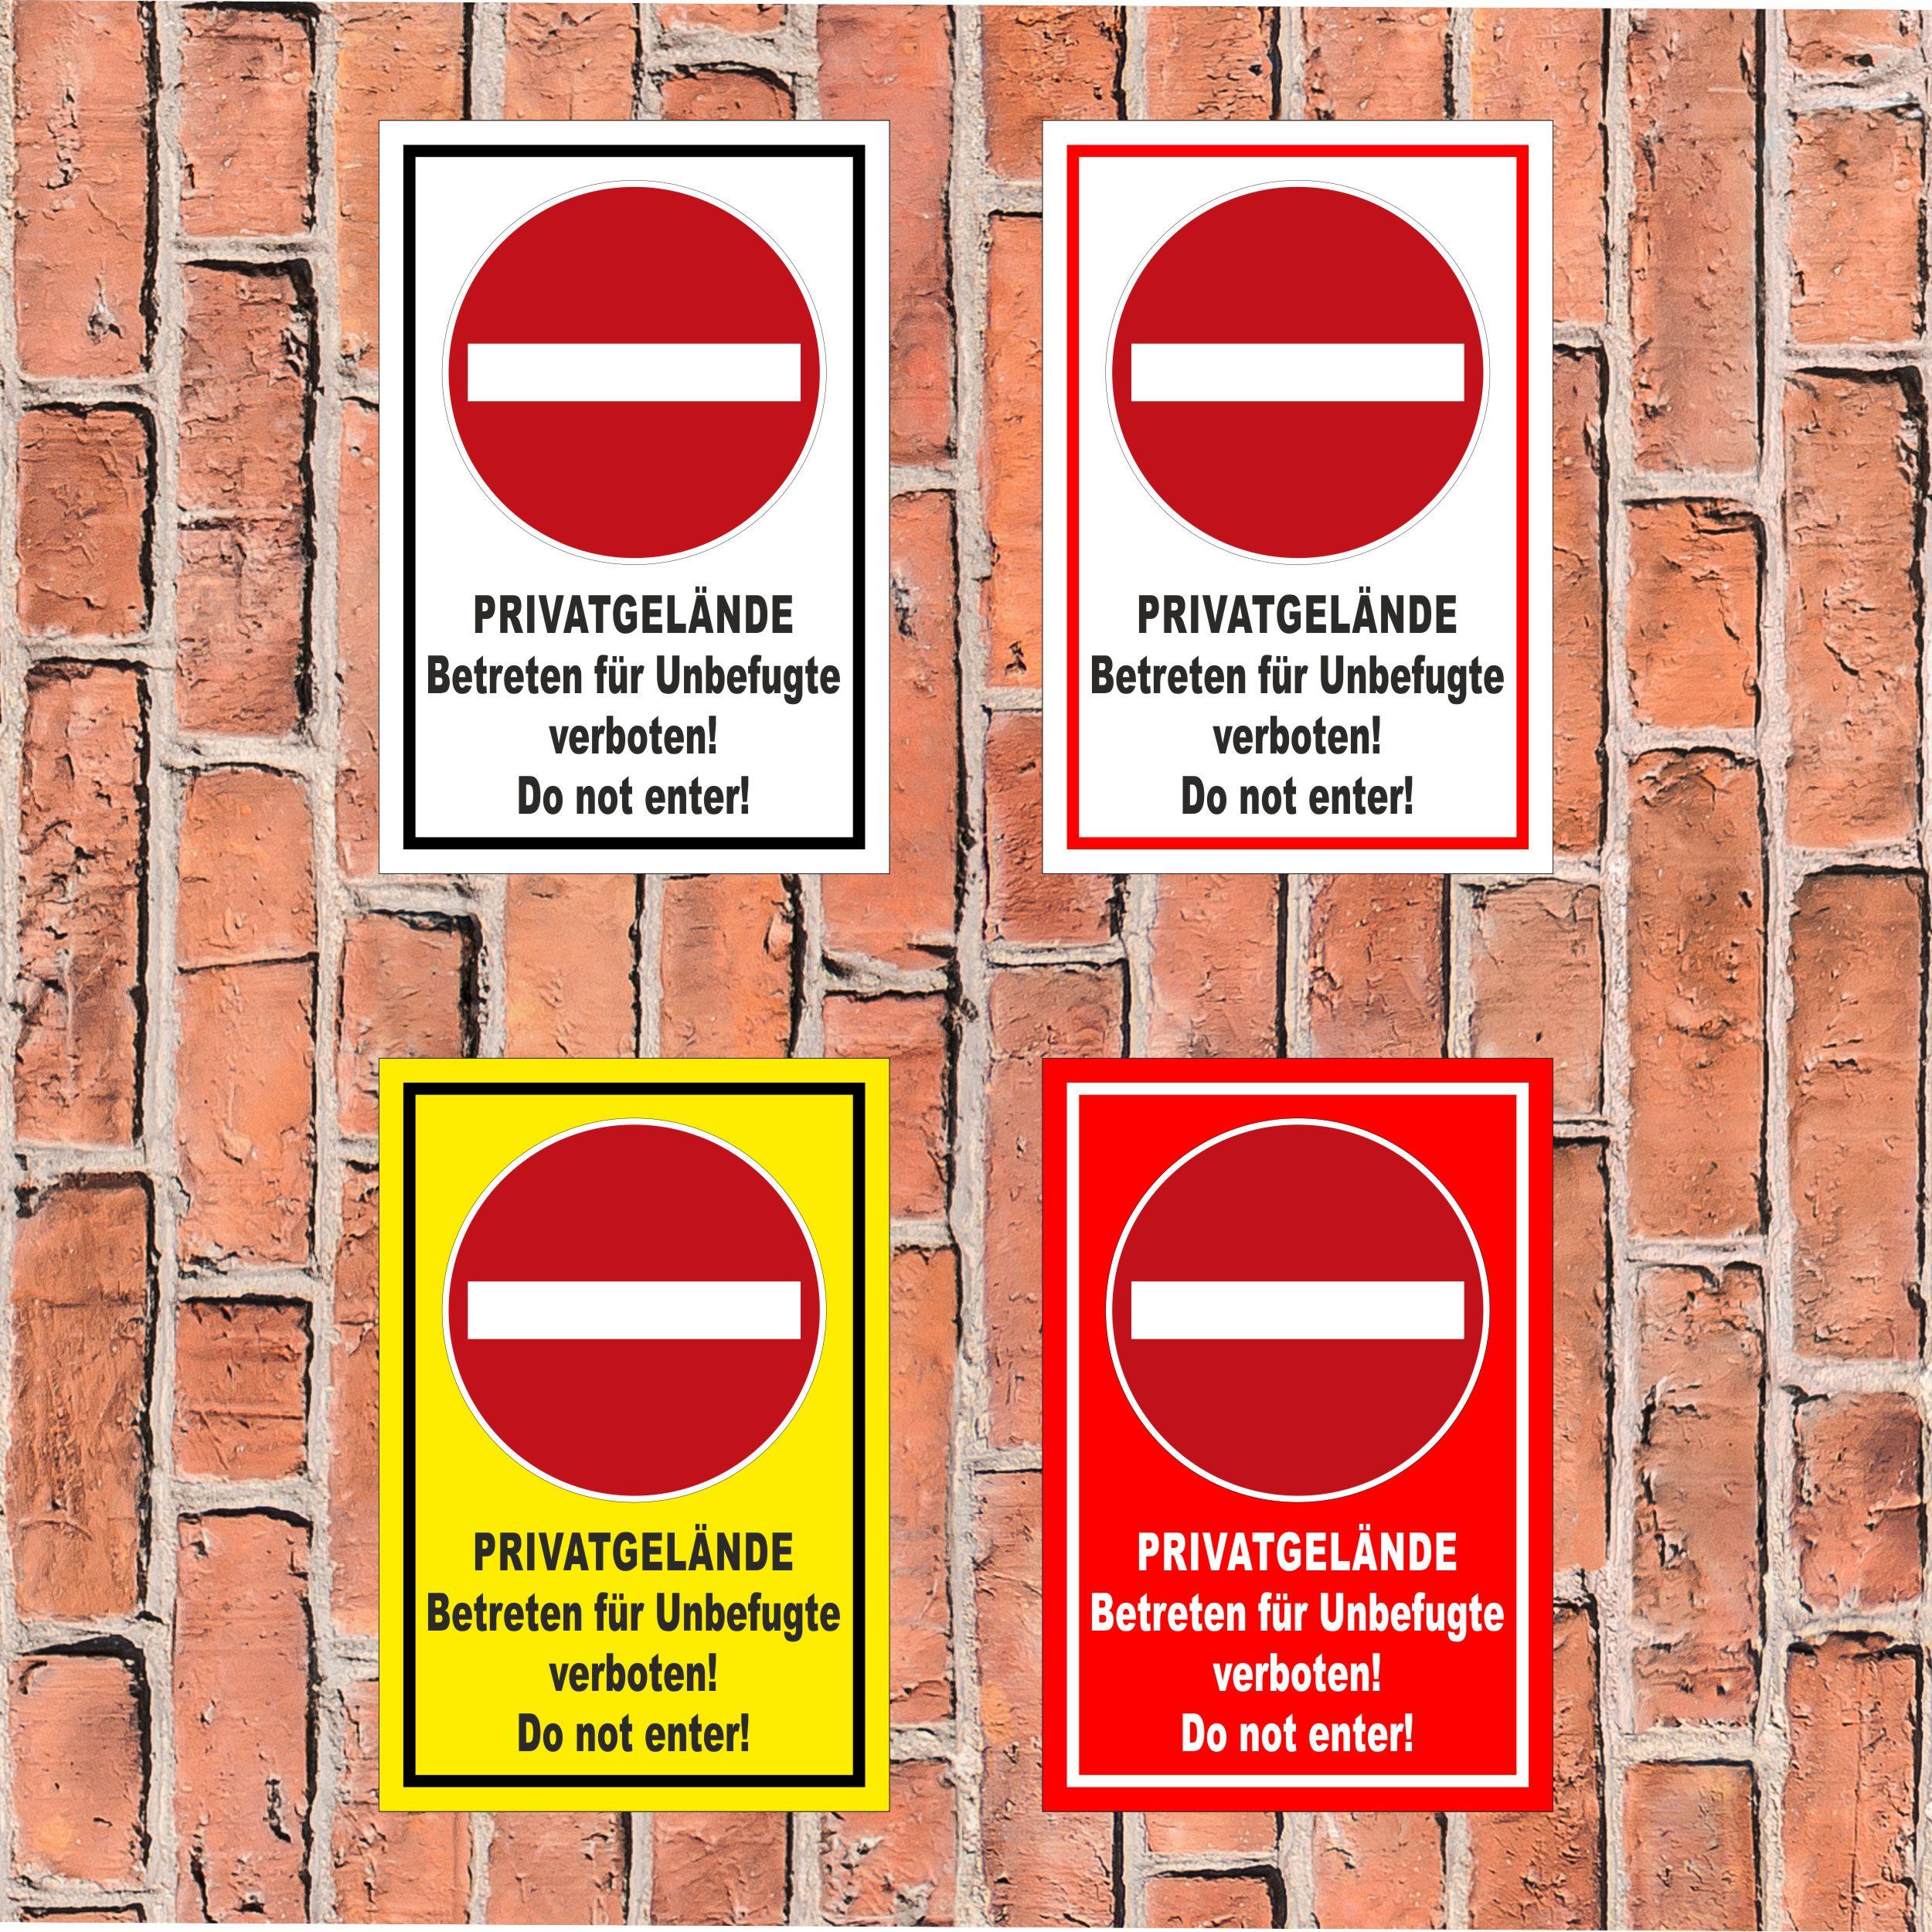 Privat Betreten verboten Schild Grundstück Unbefugte Zutritt Hartschaumplatte